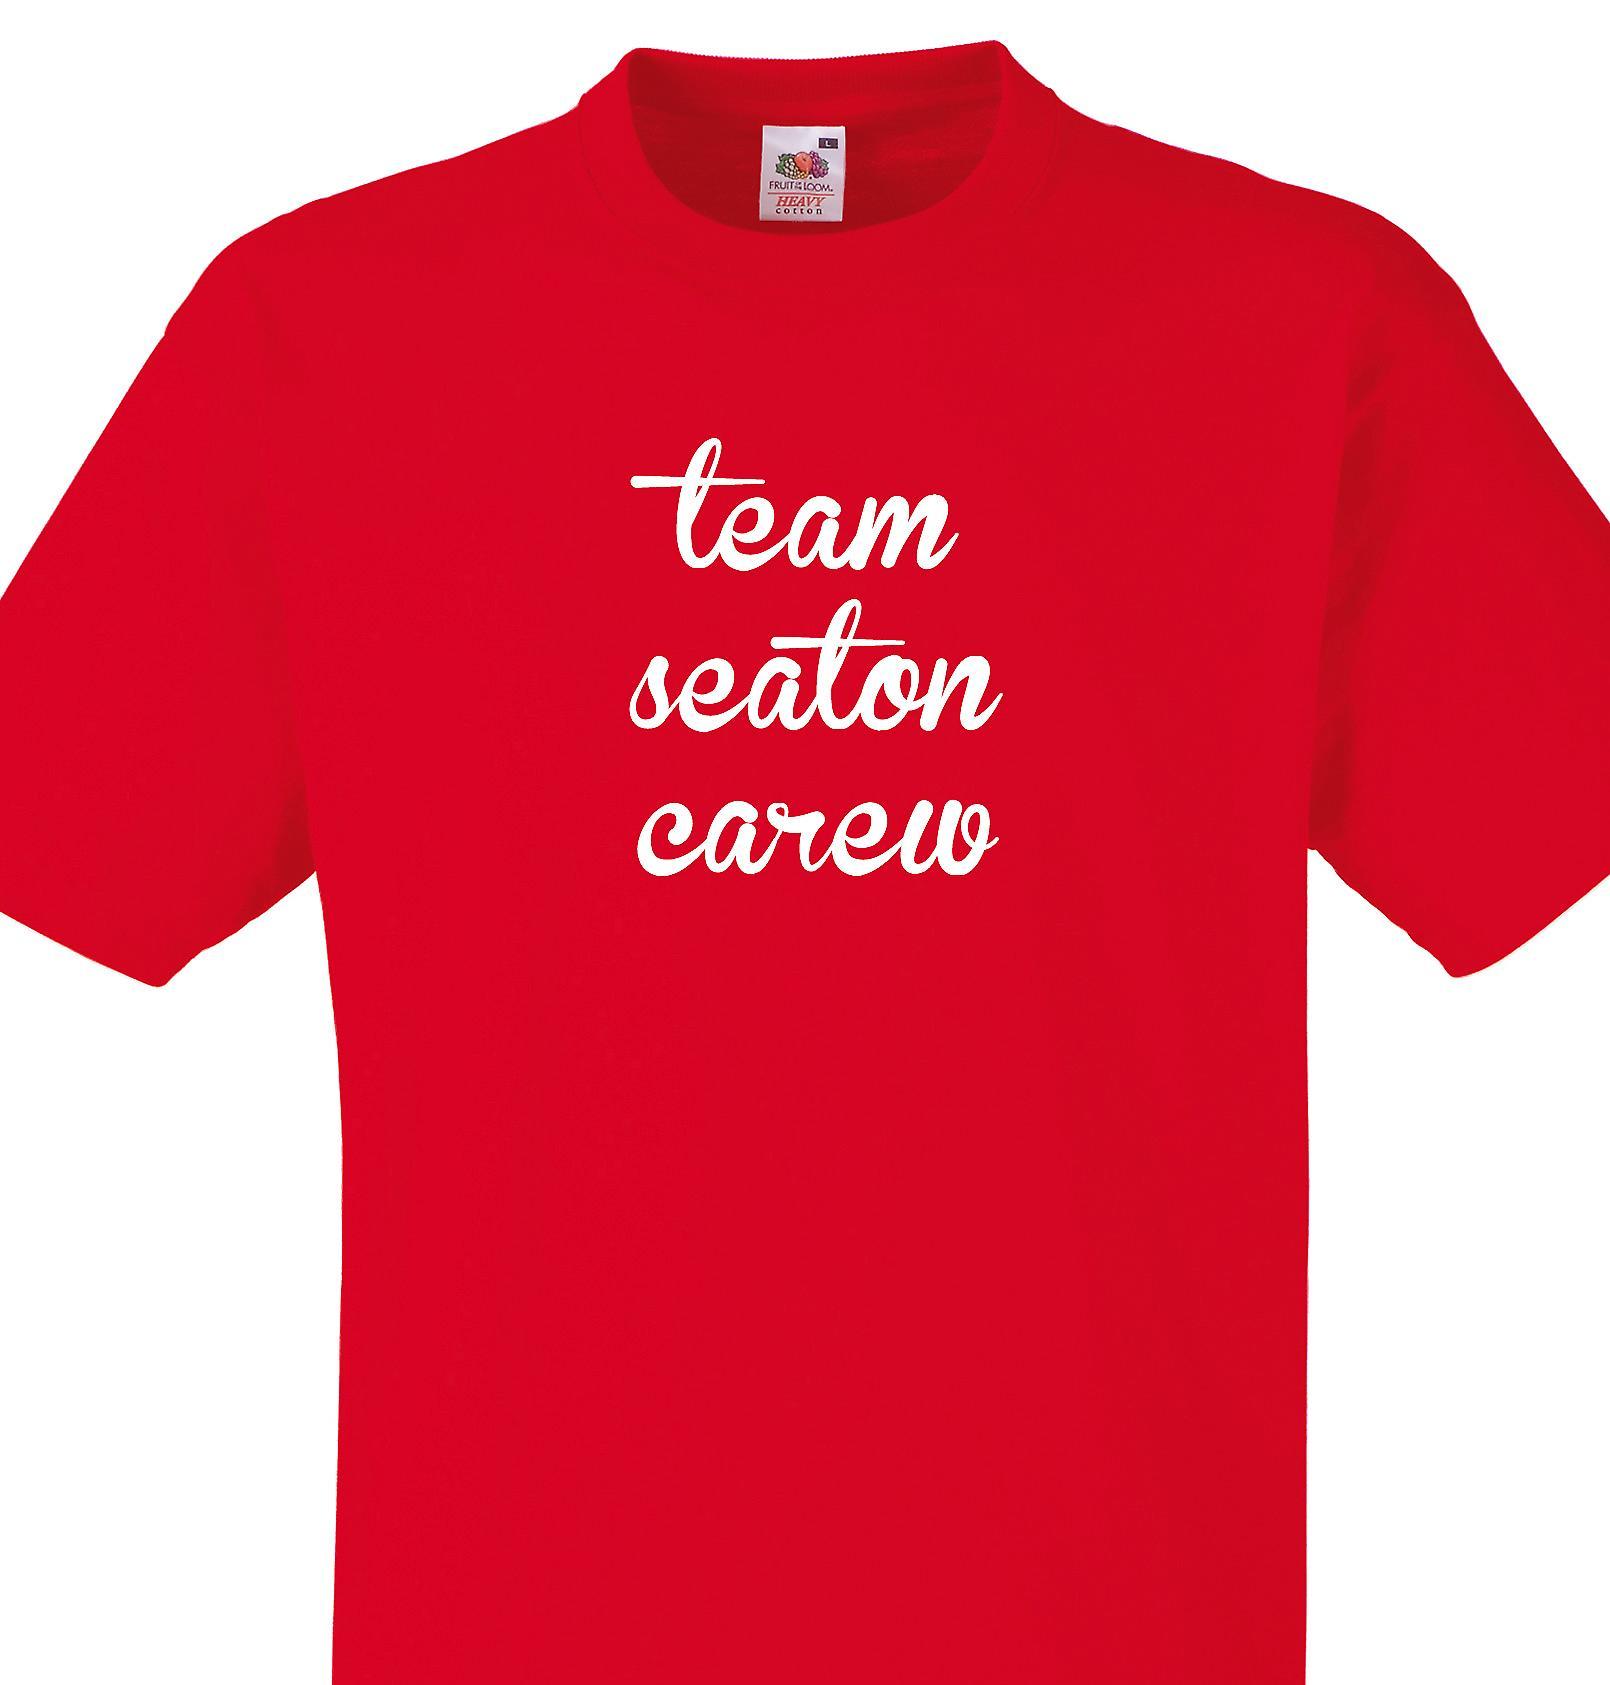 Team Seaton carew Red T shirt